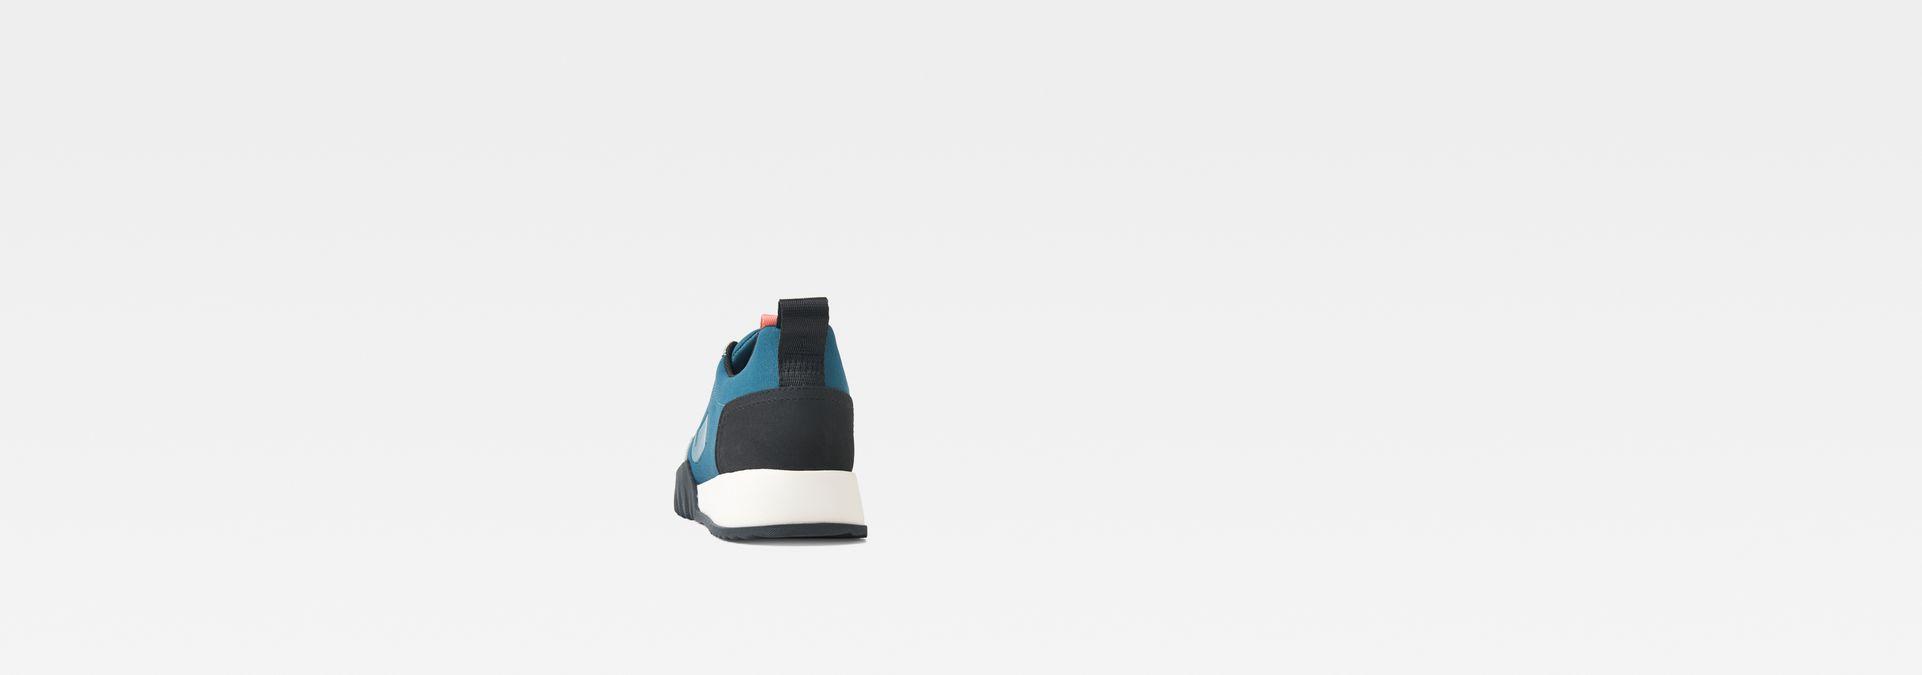 Rackam Rovic Sneakers | Bright Billet Green | Dames | G Star